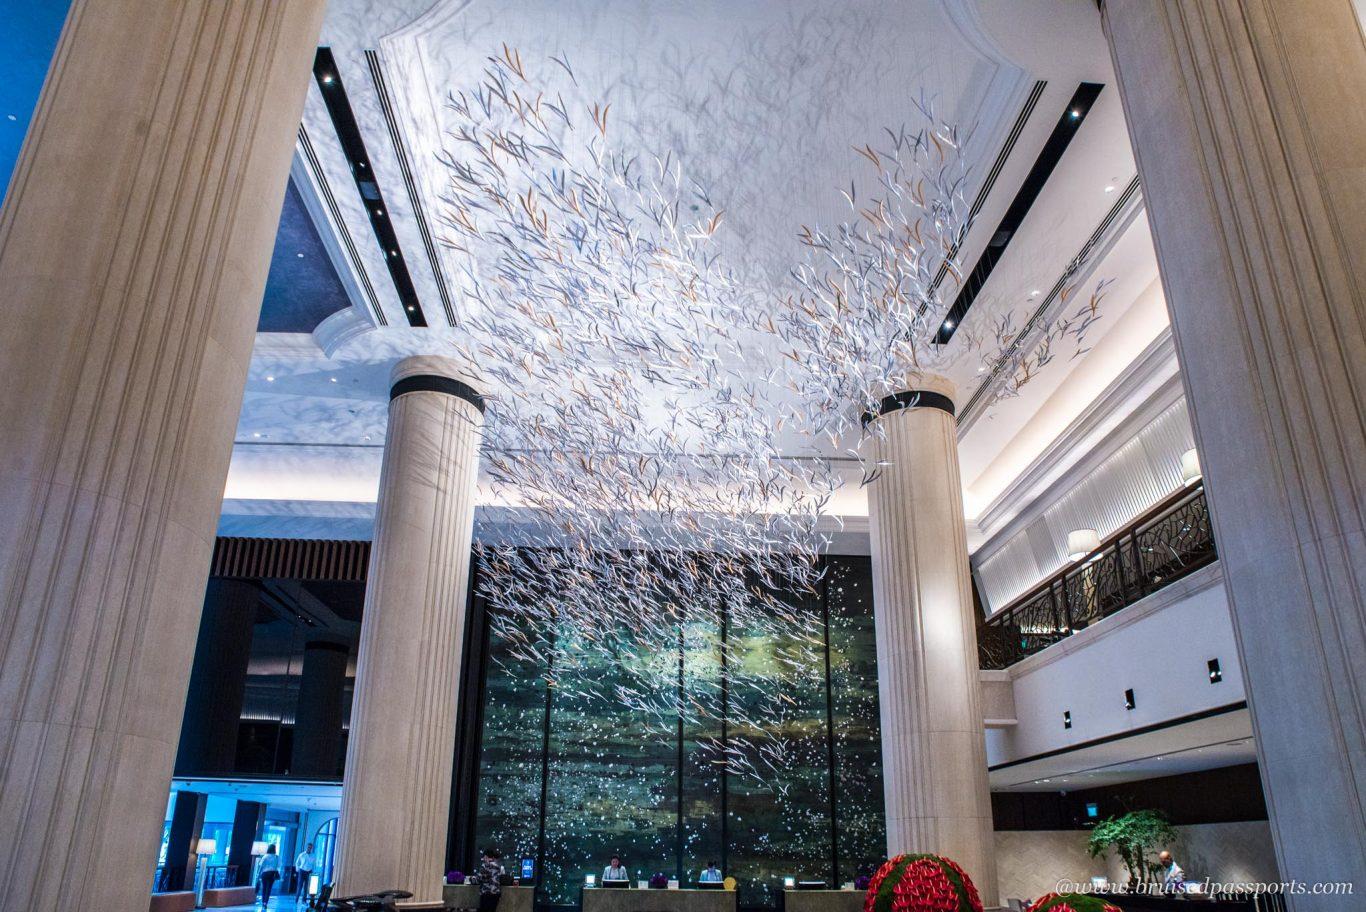 Lobby at Shangri-La Singapore